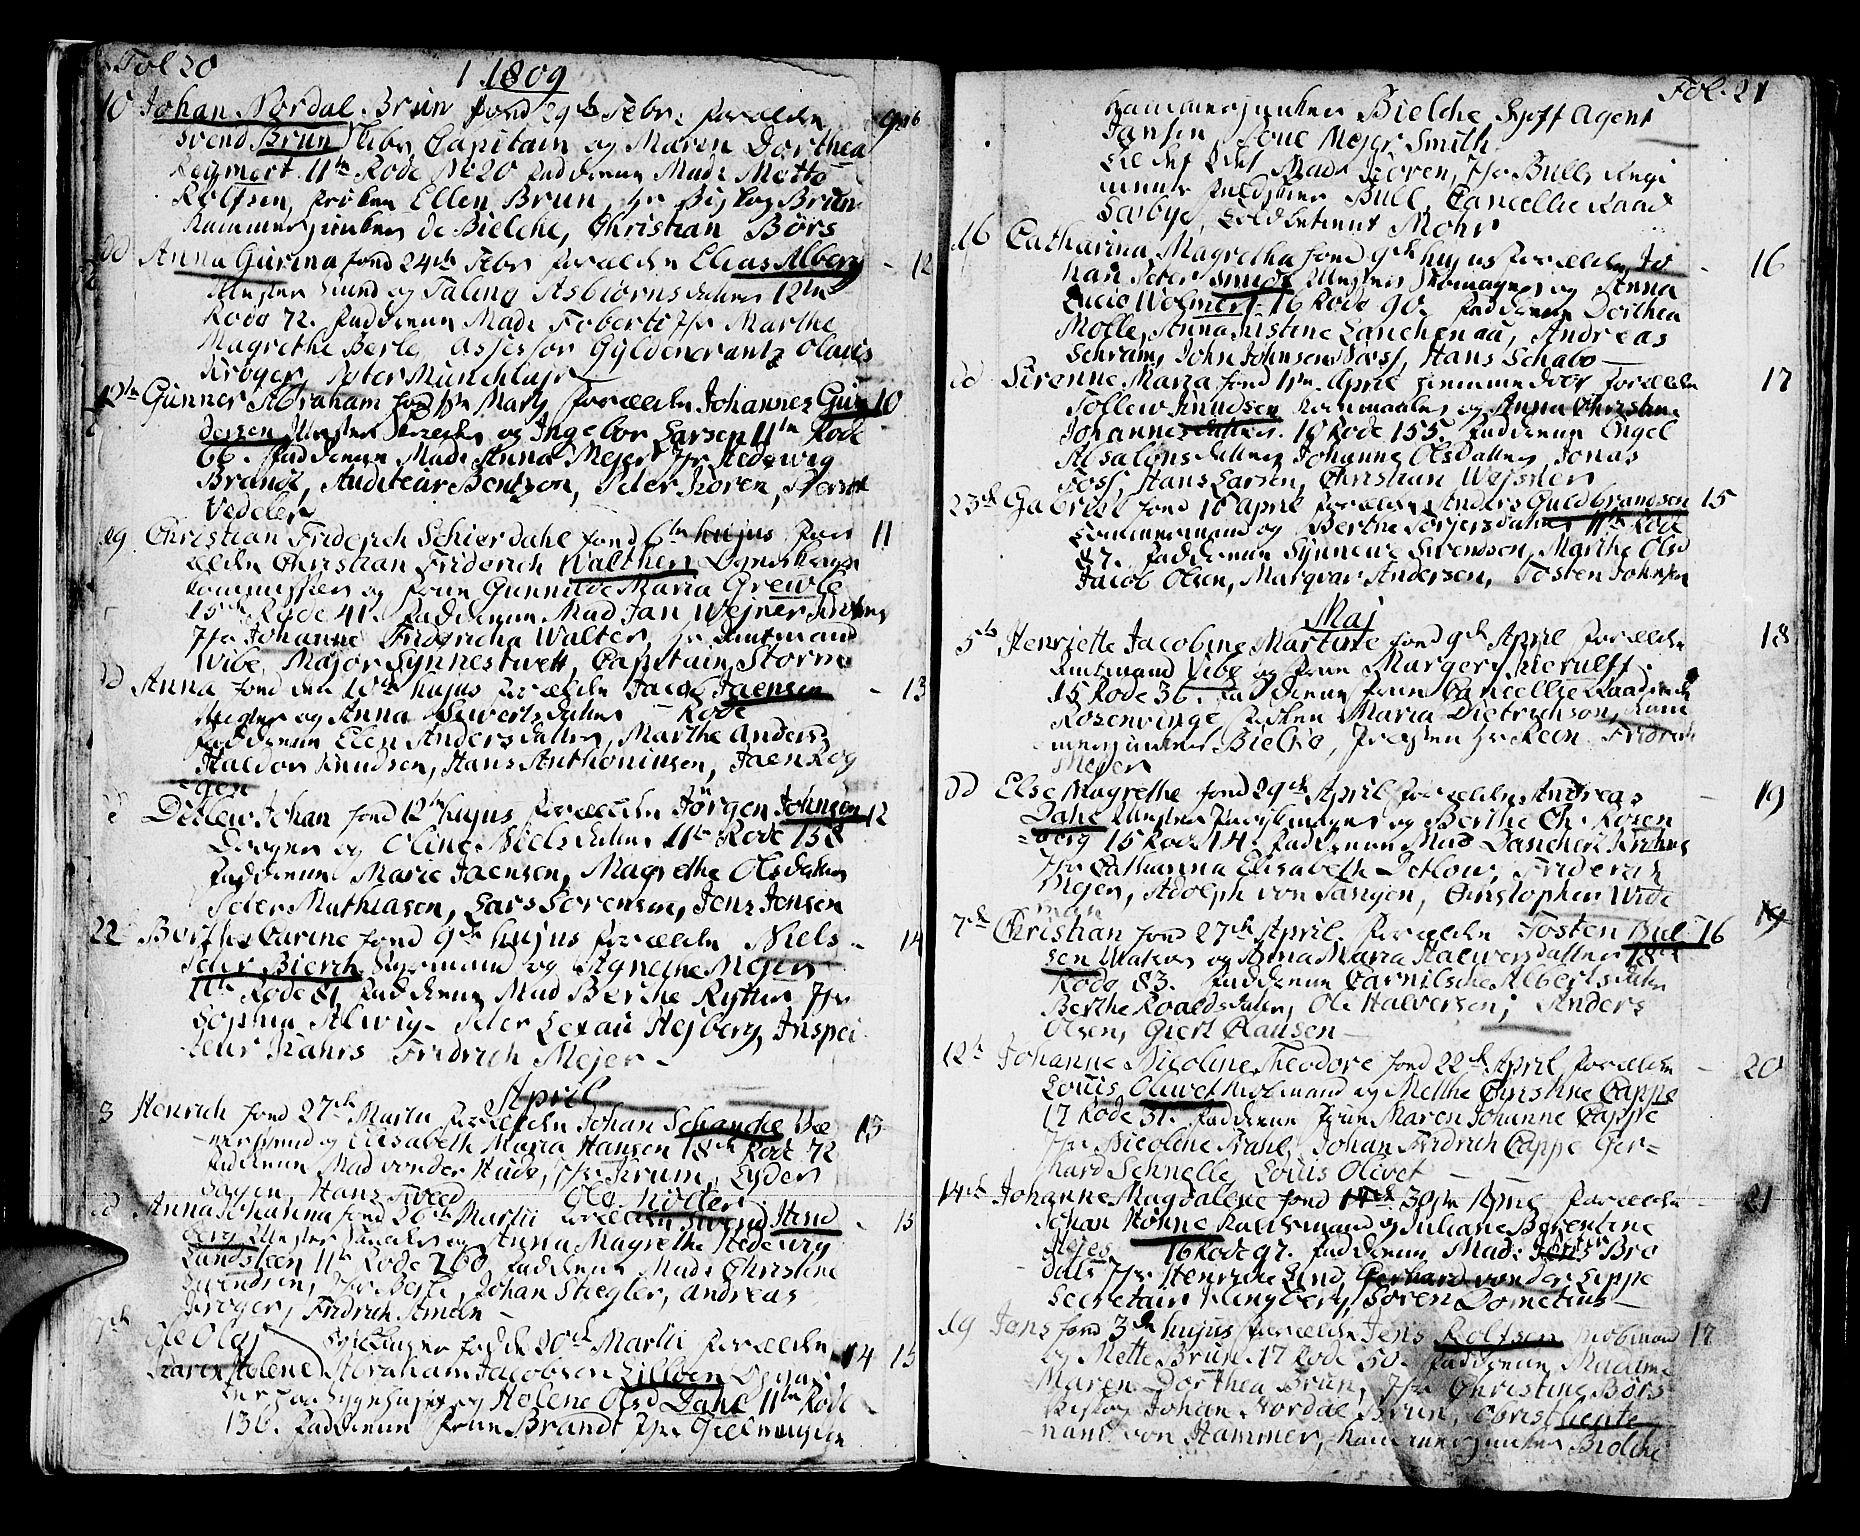 SAB, Domkirken Sokneprestembete, H/Haa/L0005: Ministerialbok nr. A 5, 1808-1820, s. 20-21